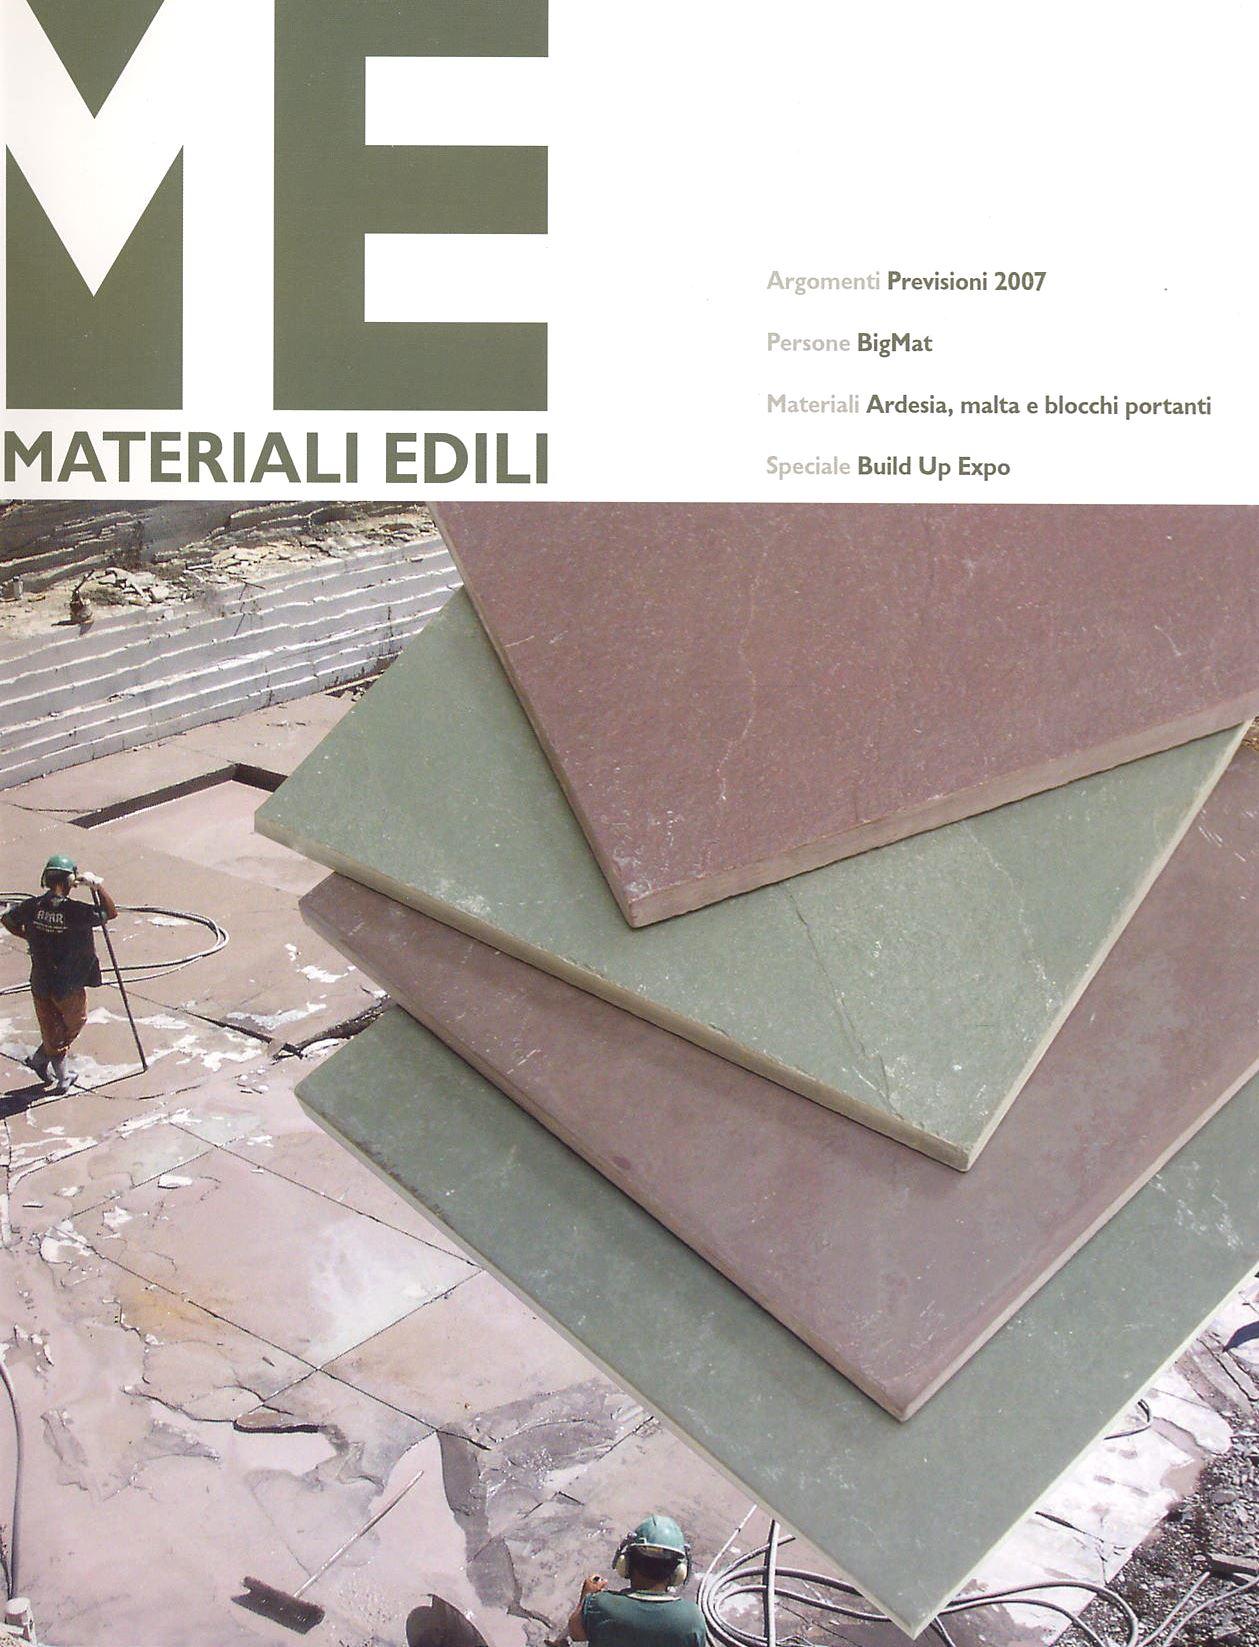 Brasilian slate, nature and technology - Alessandro Villa architect